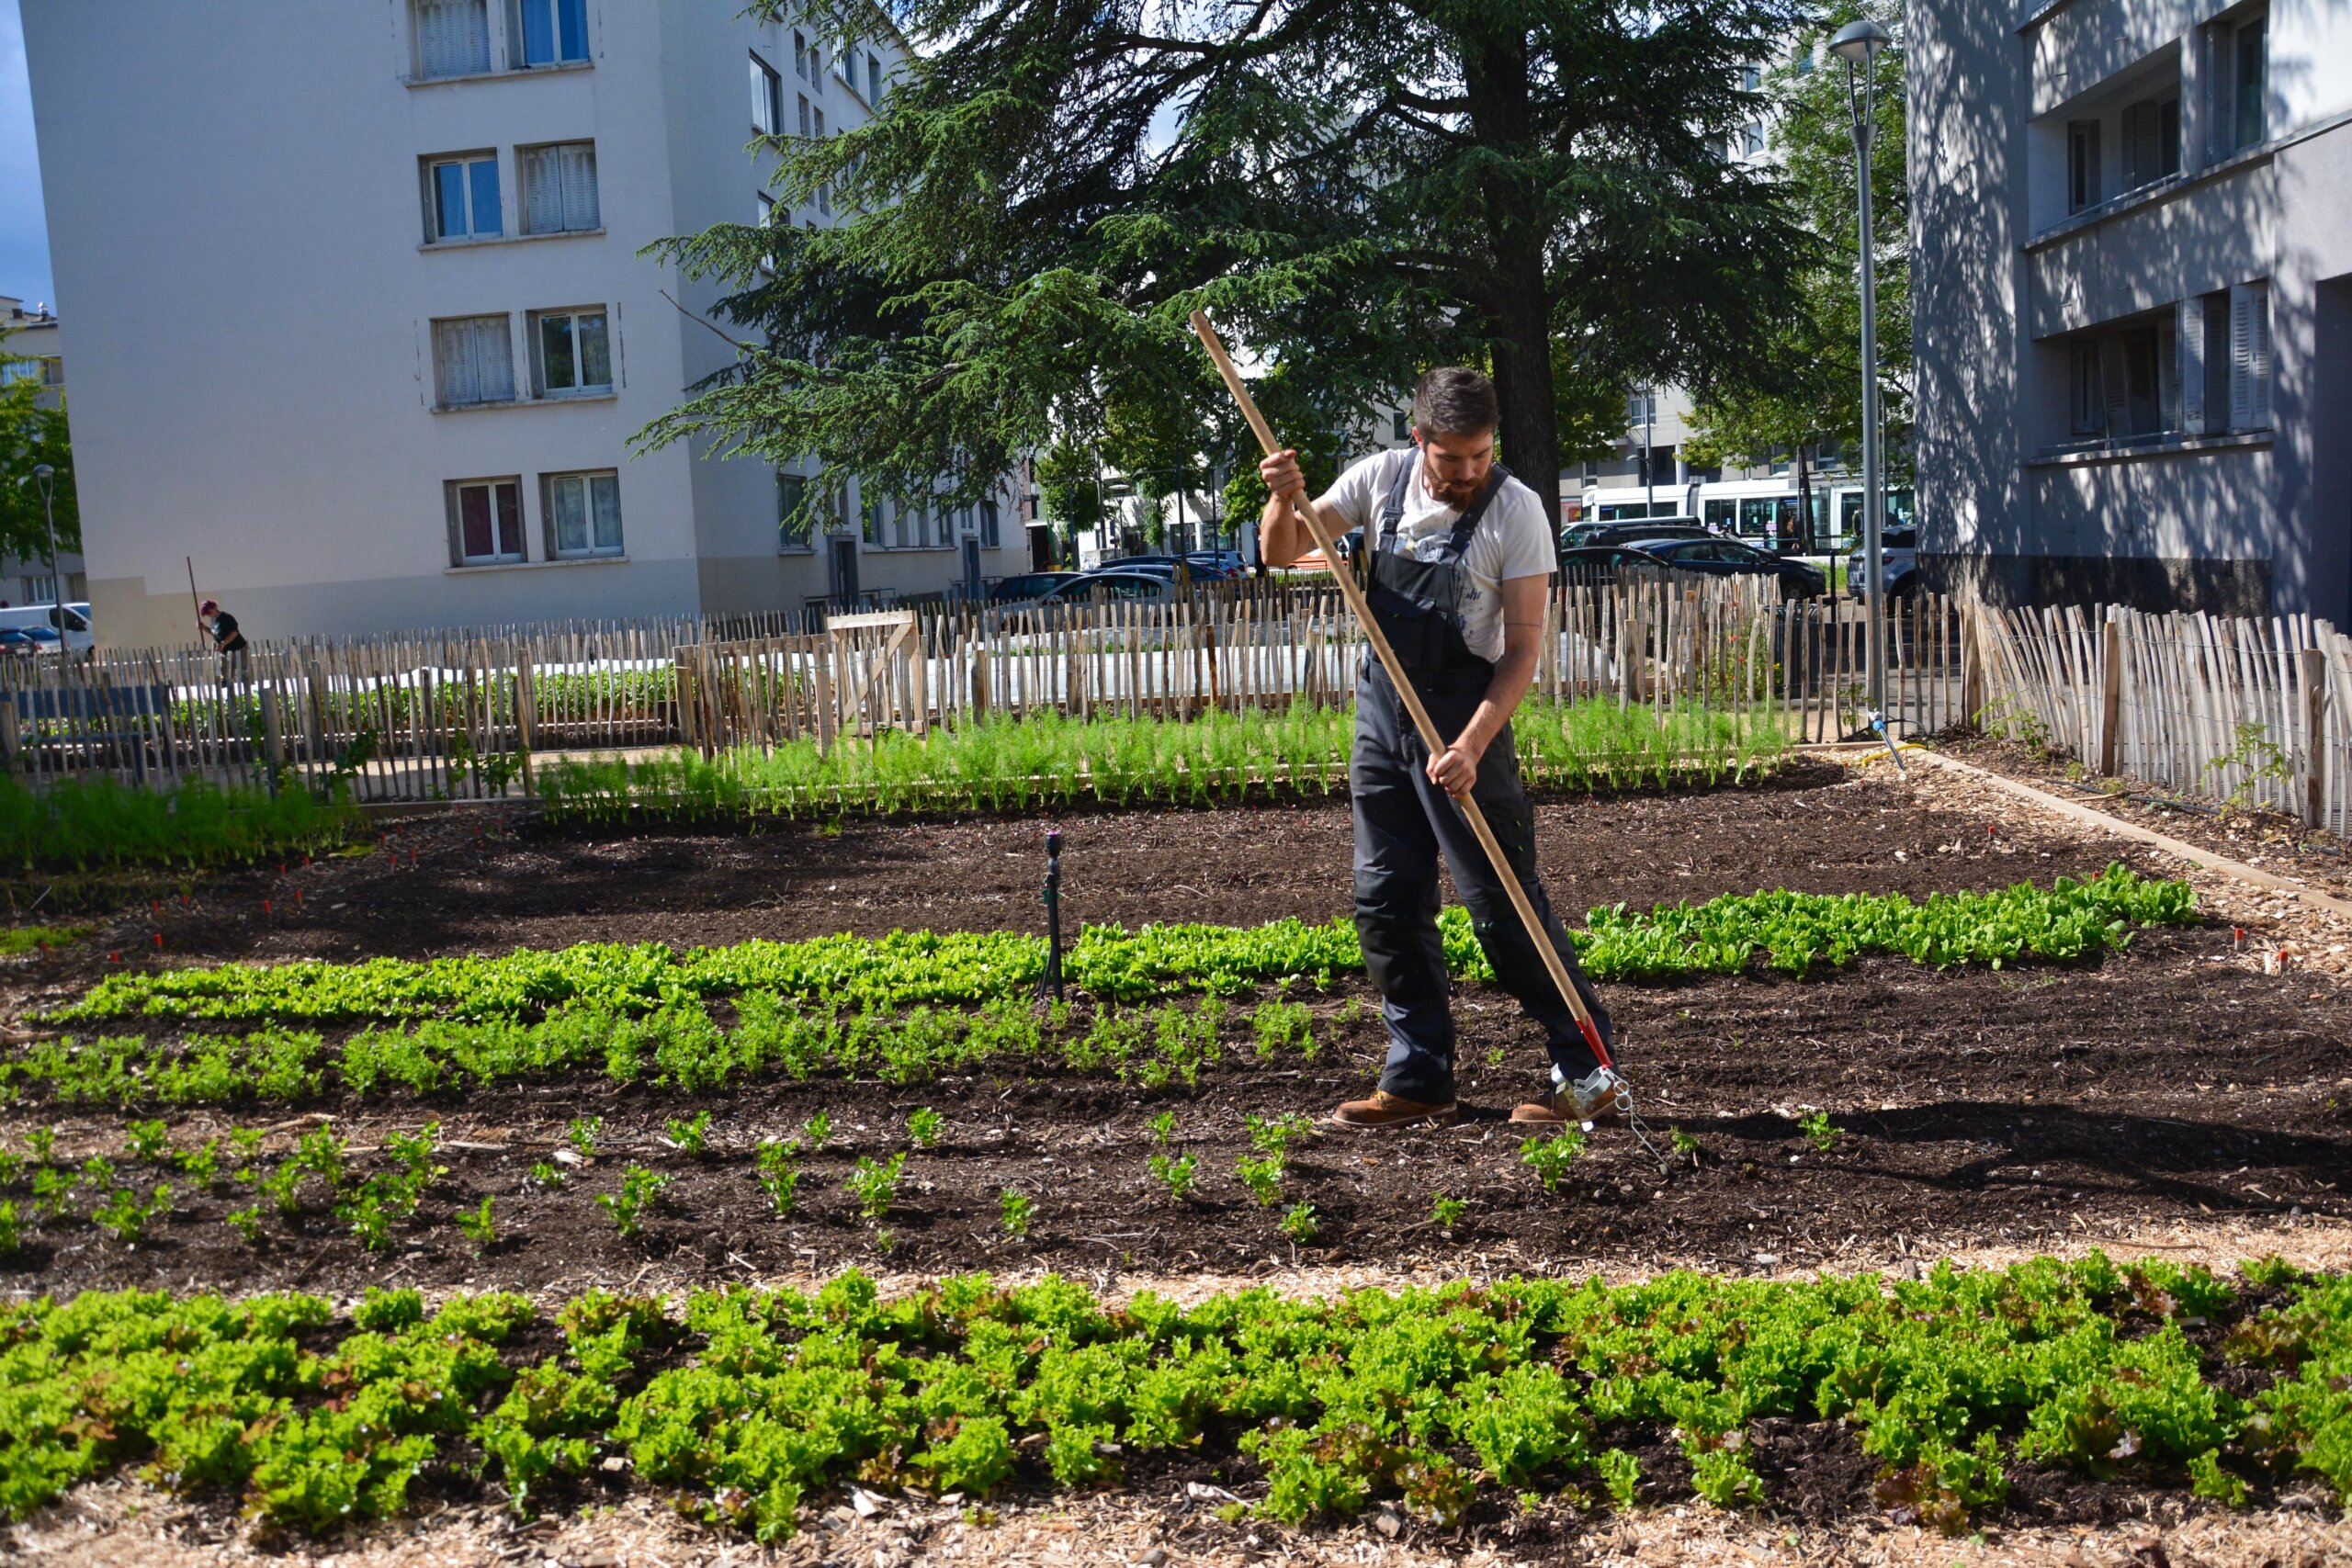 ferme urbaine Lyon Nicolas Gauthier au travail